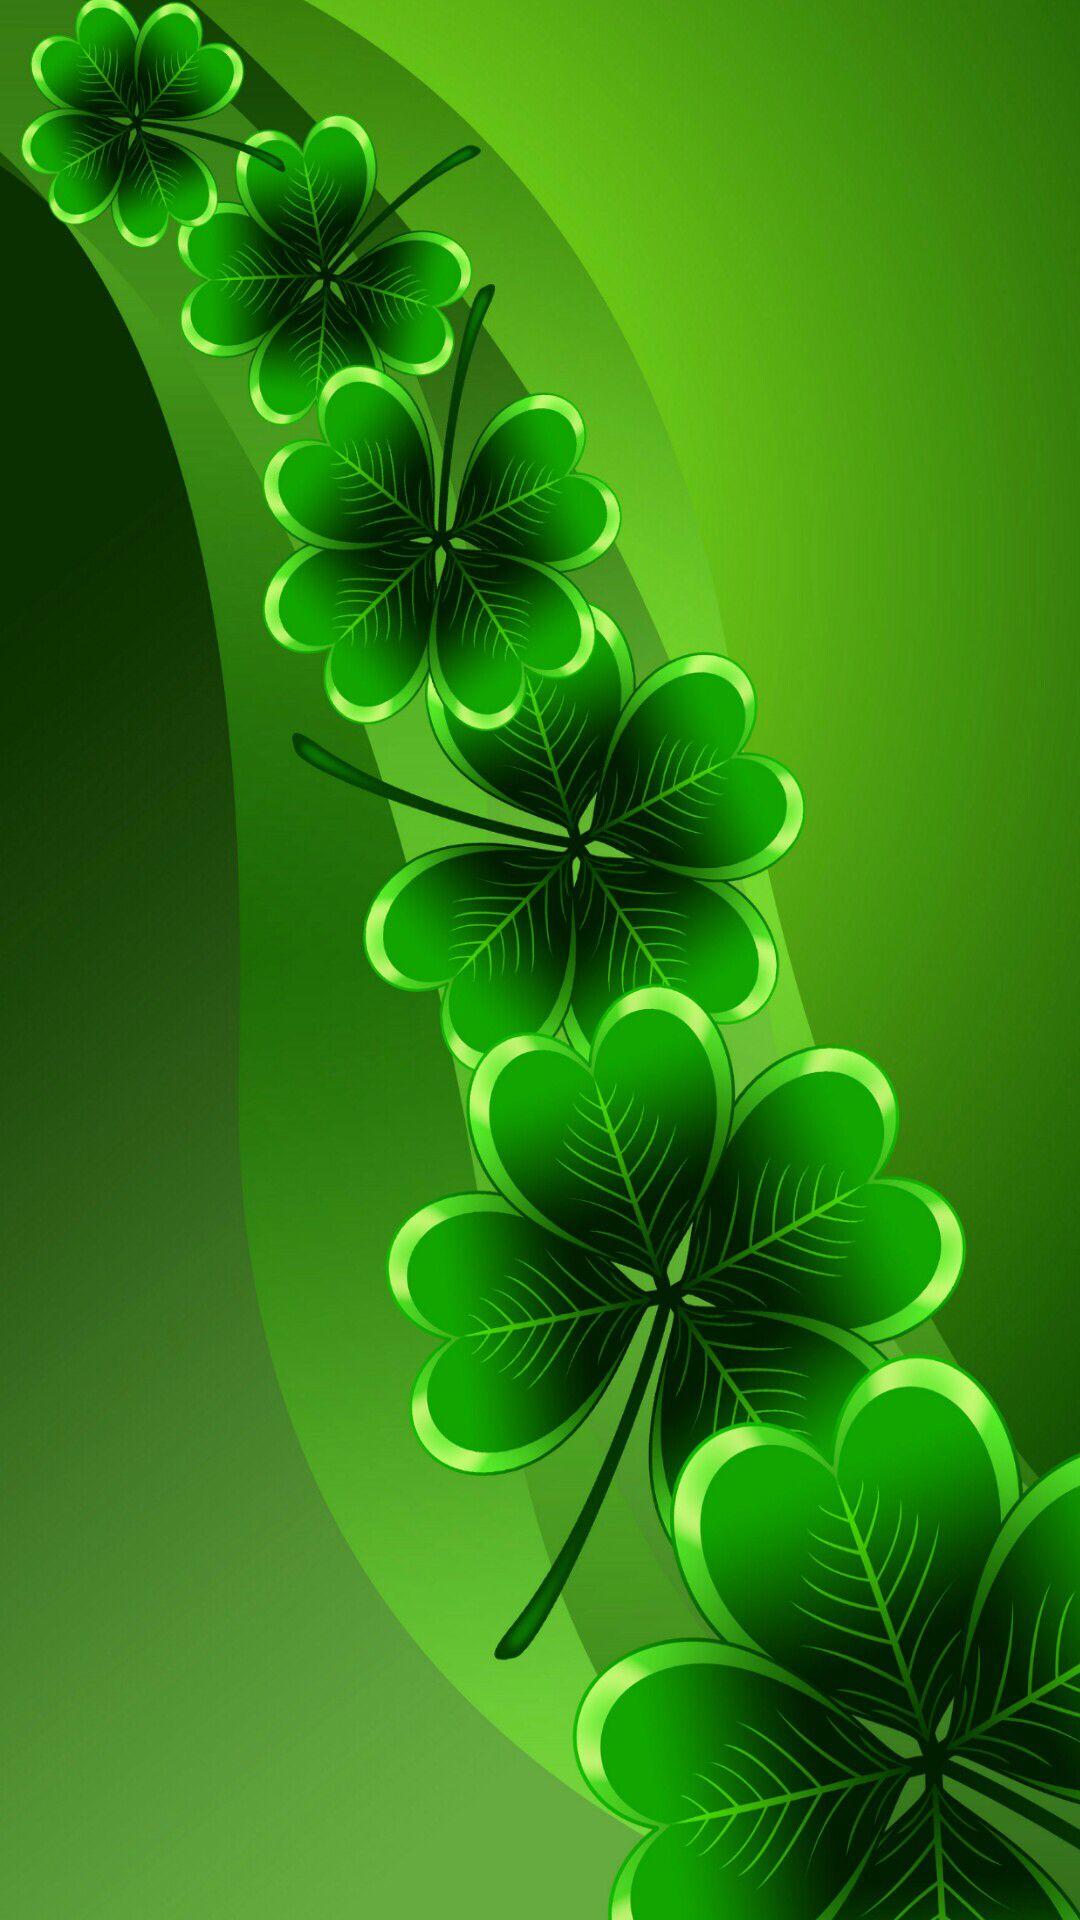 Shamrocks Flower Wallpaper St Patricks Day Wallpaper Green Wallpaper